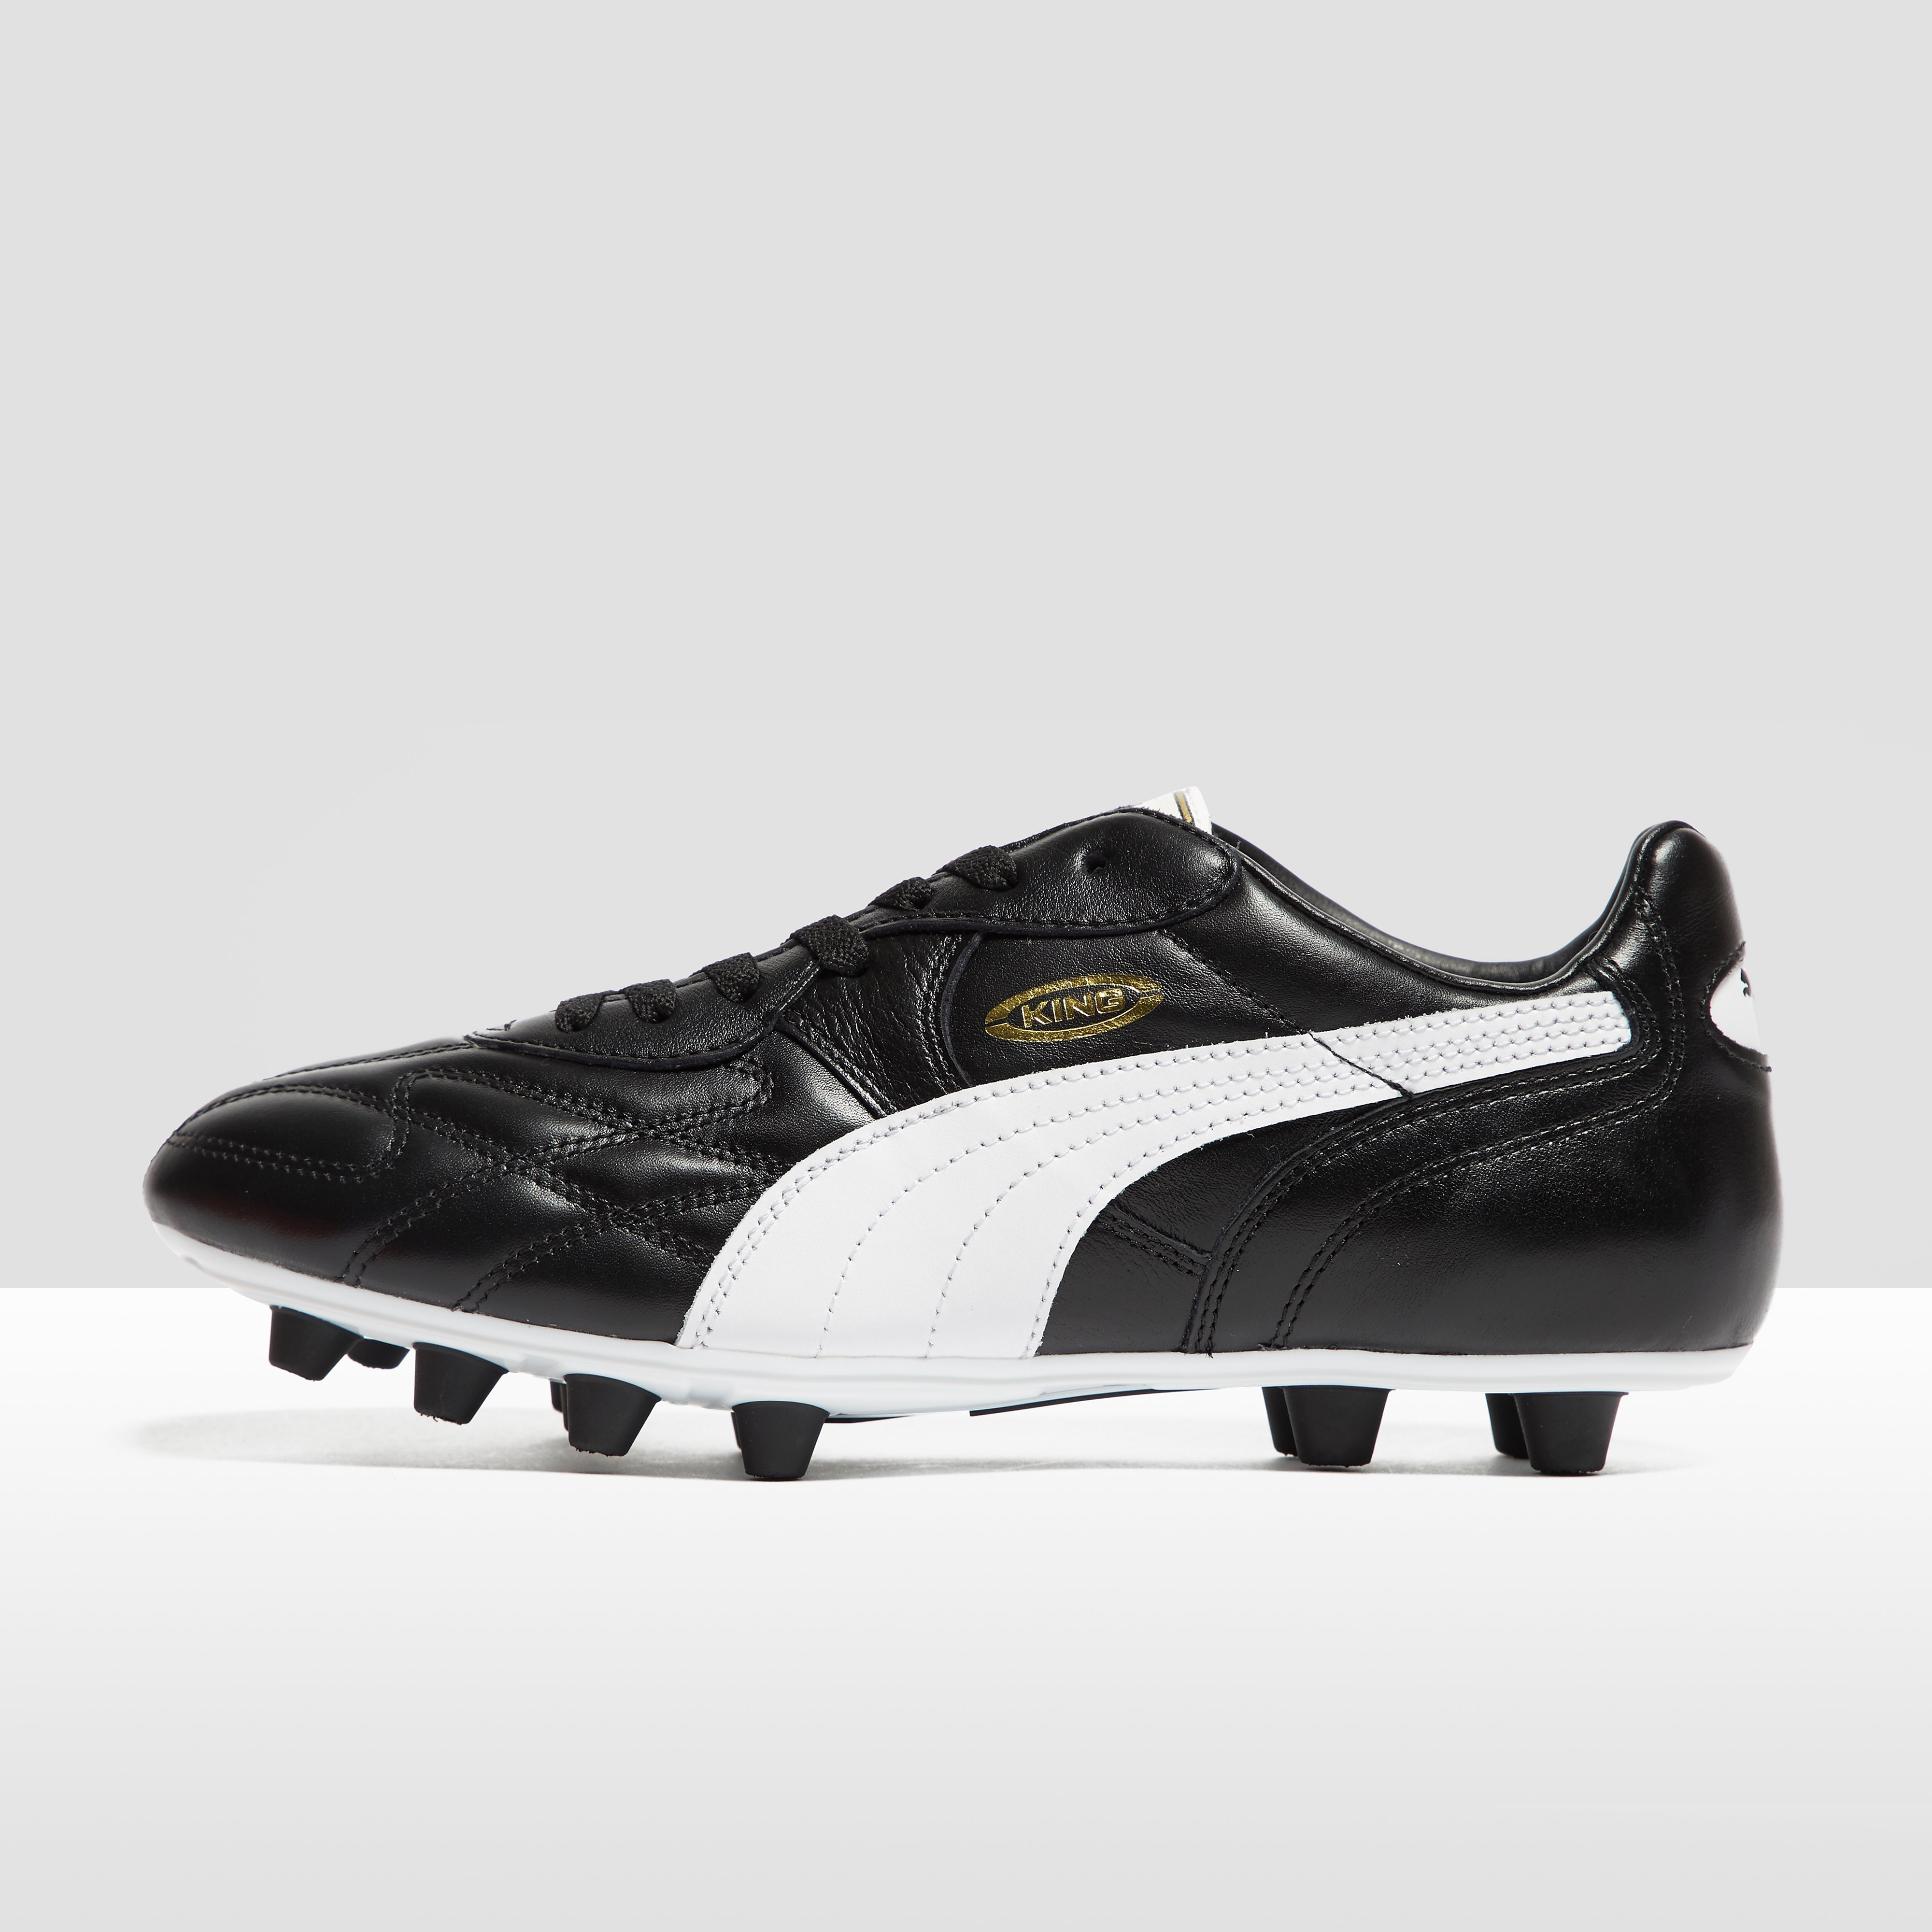 PUMA King Men's Football Boots